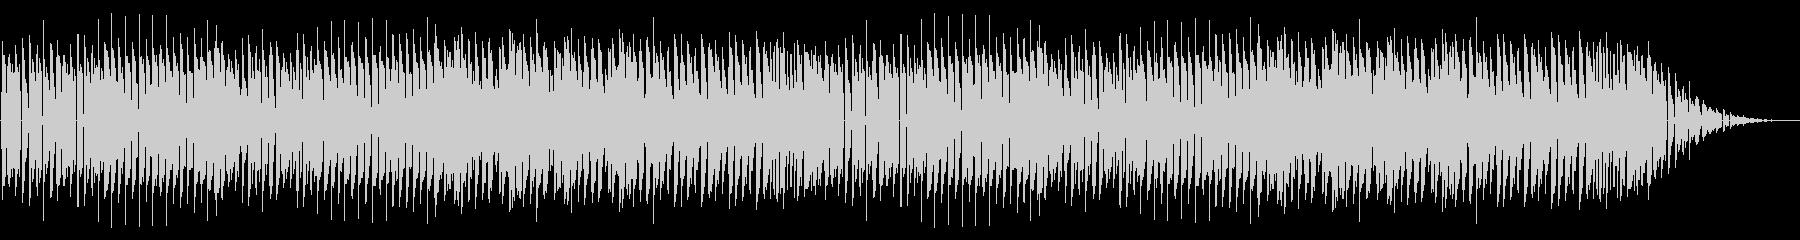 NES アクションD06-1(ステージ5の未再生の波形